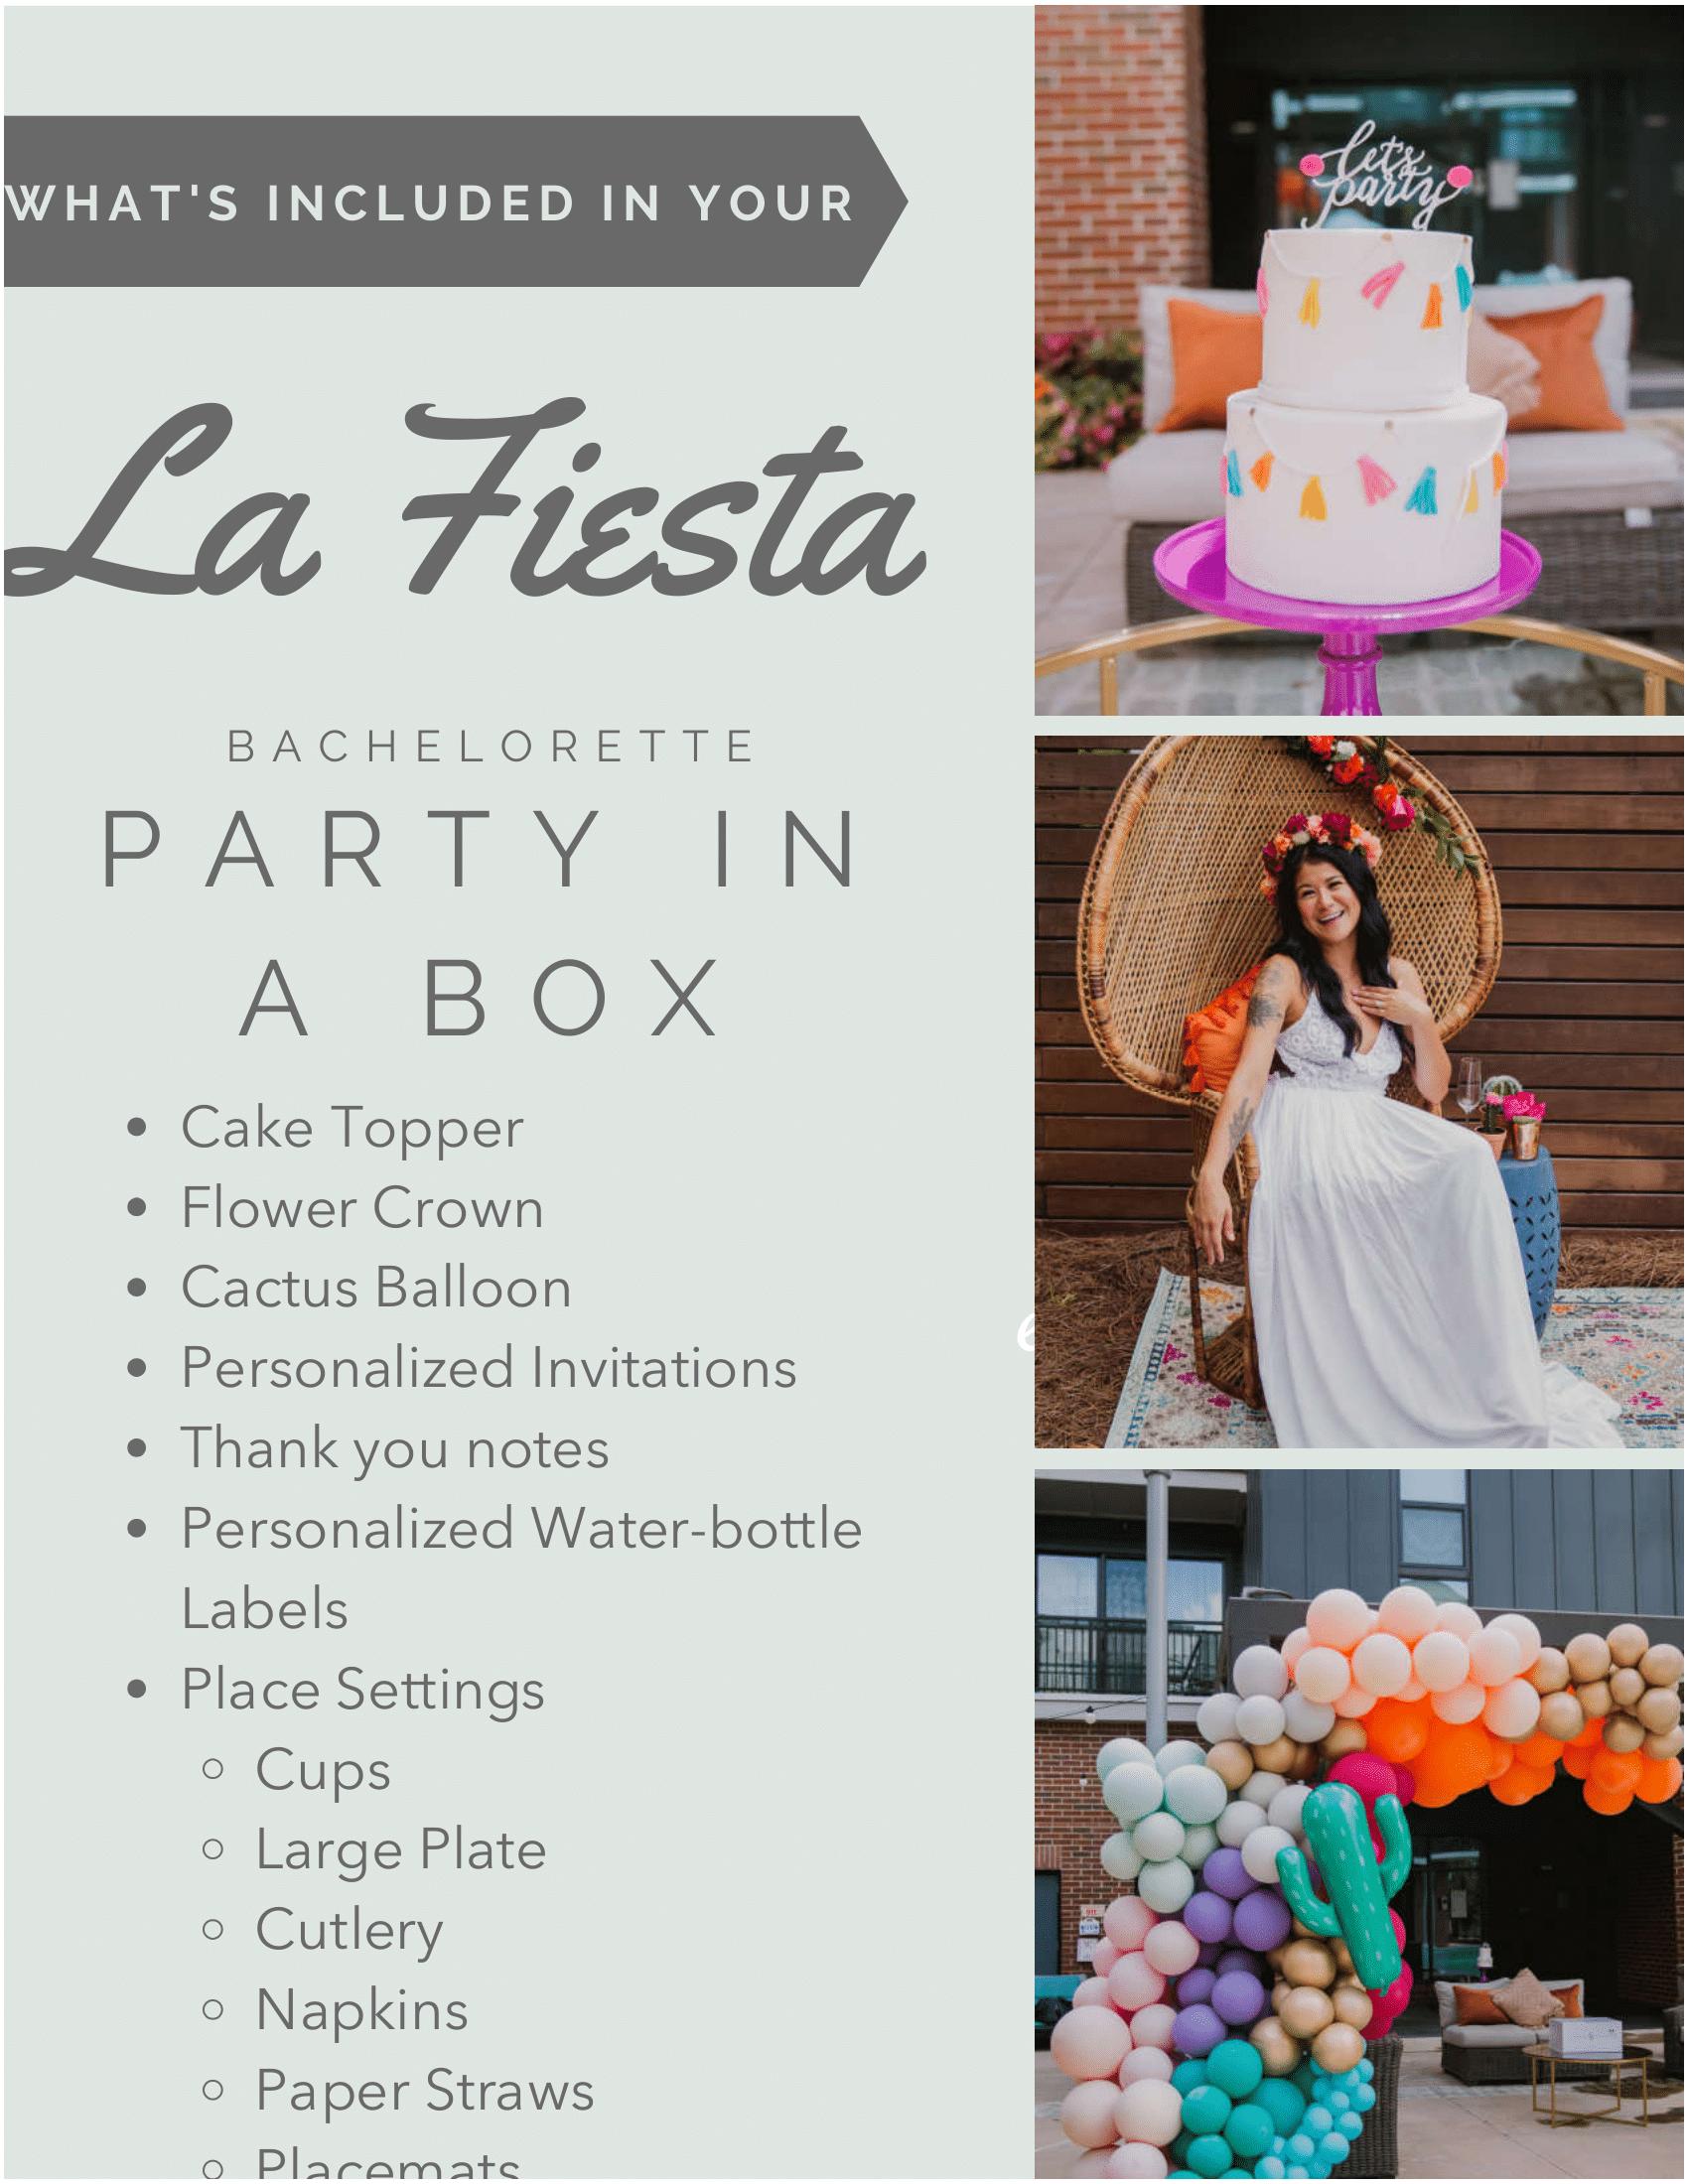 Whats Included - La Fiesta